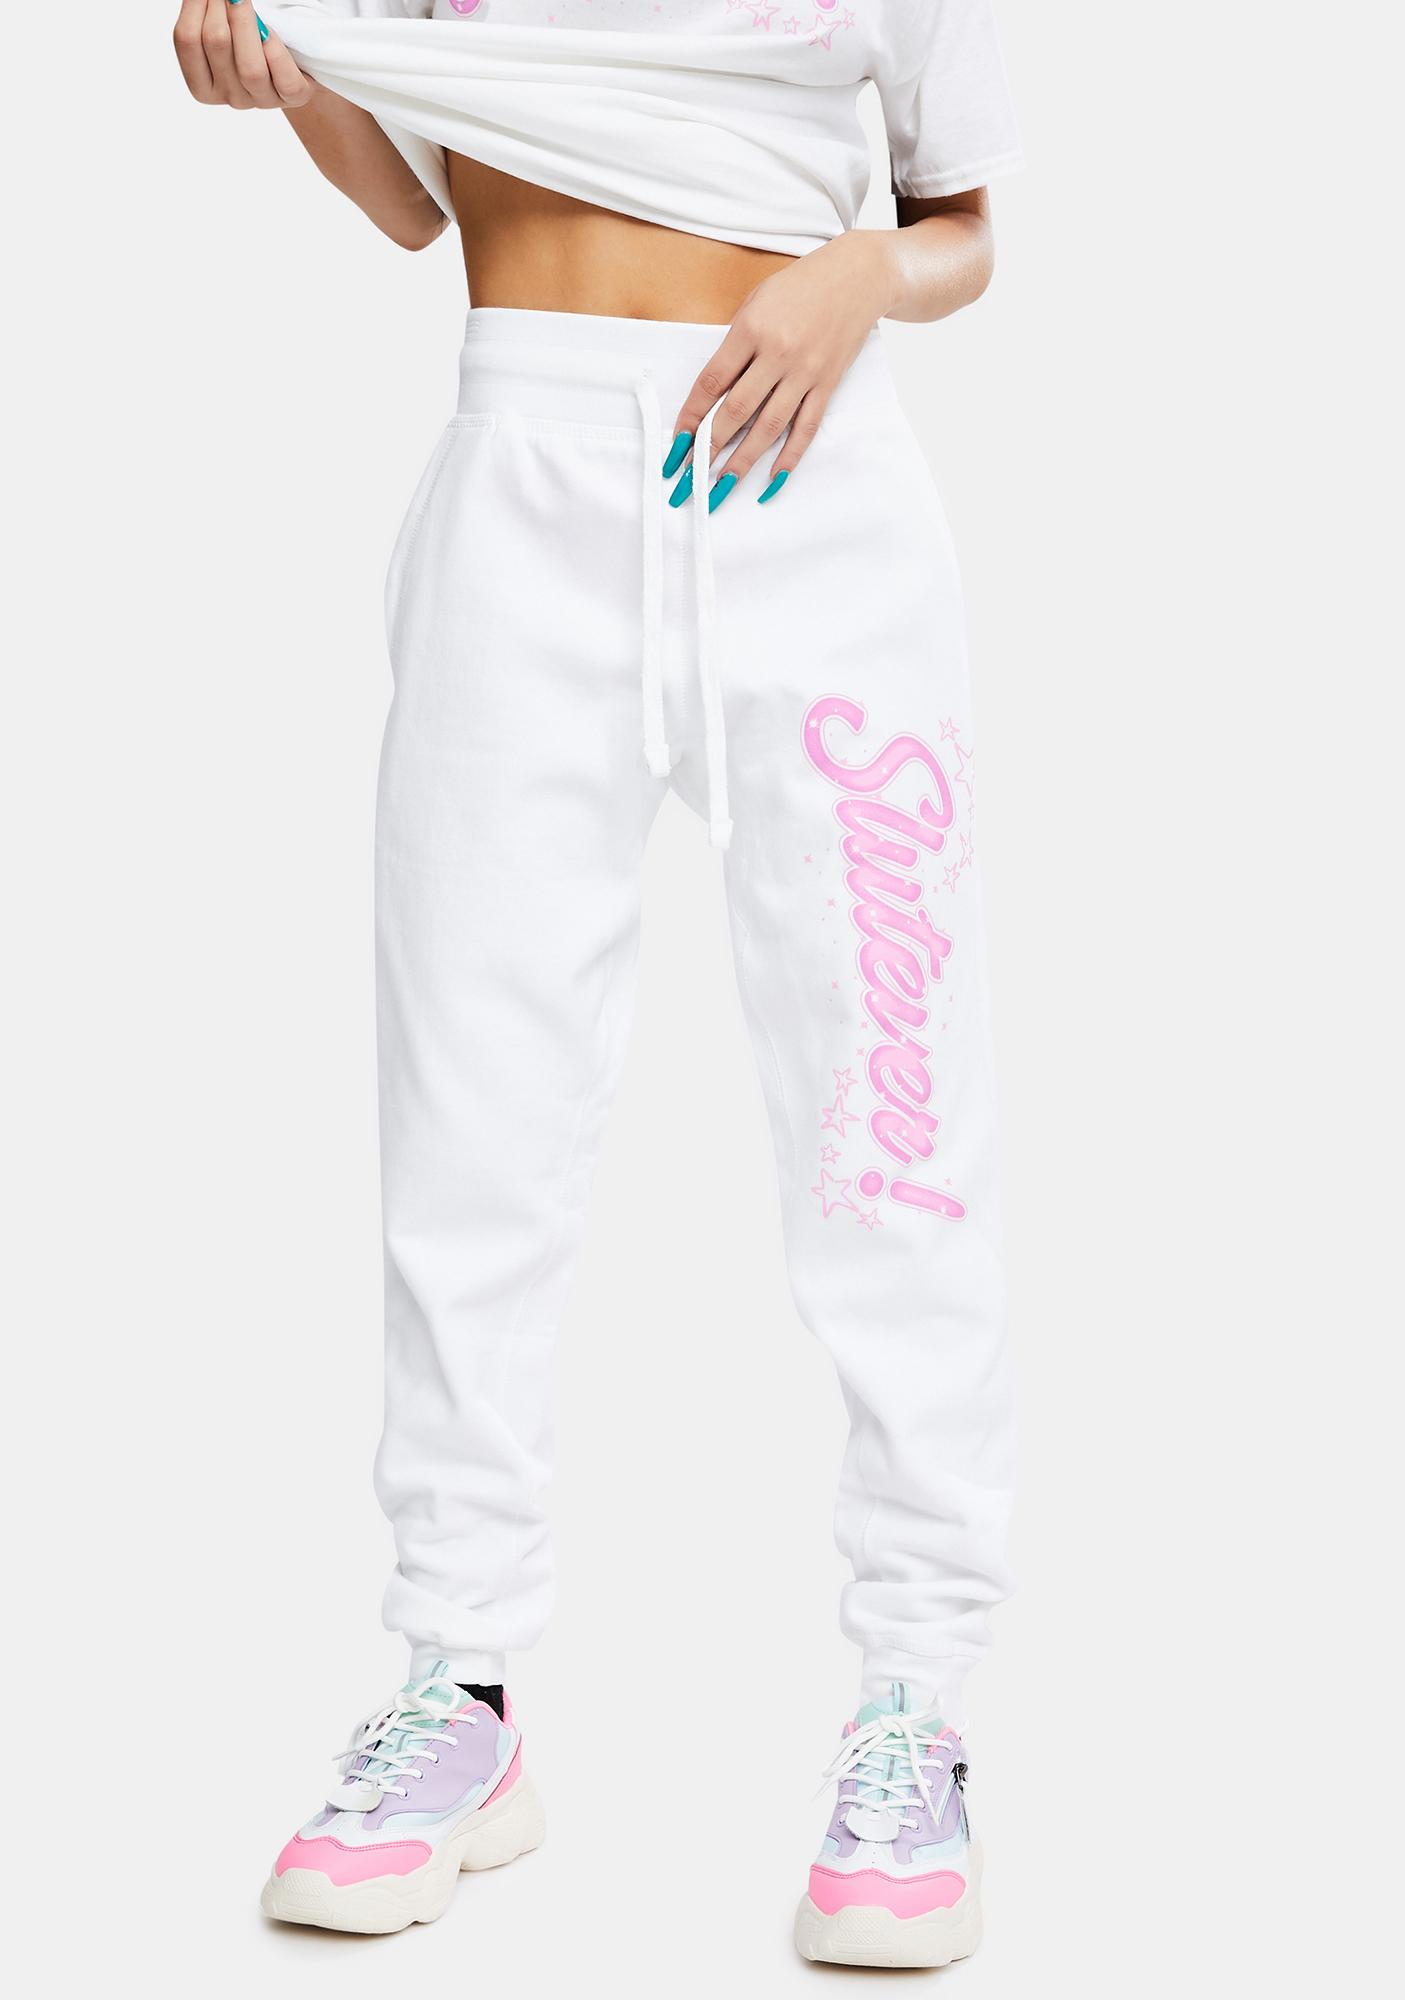 Dreamboy Slutever Sweatpants